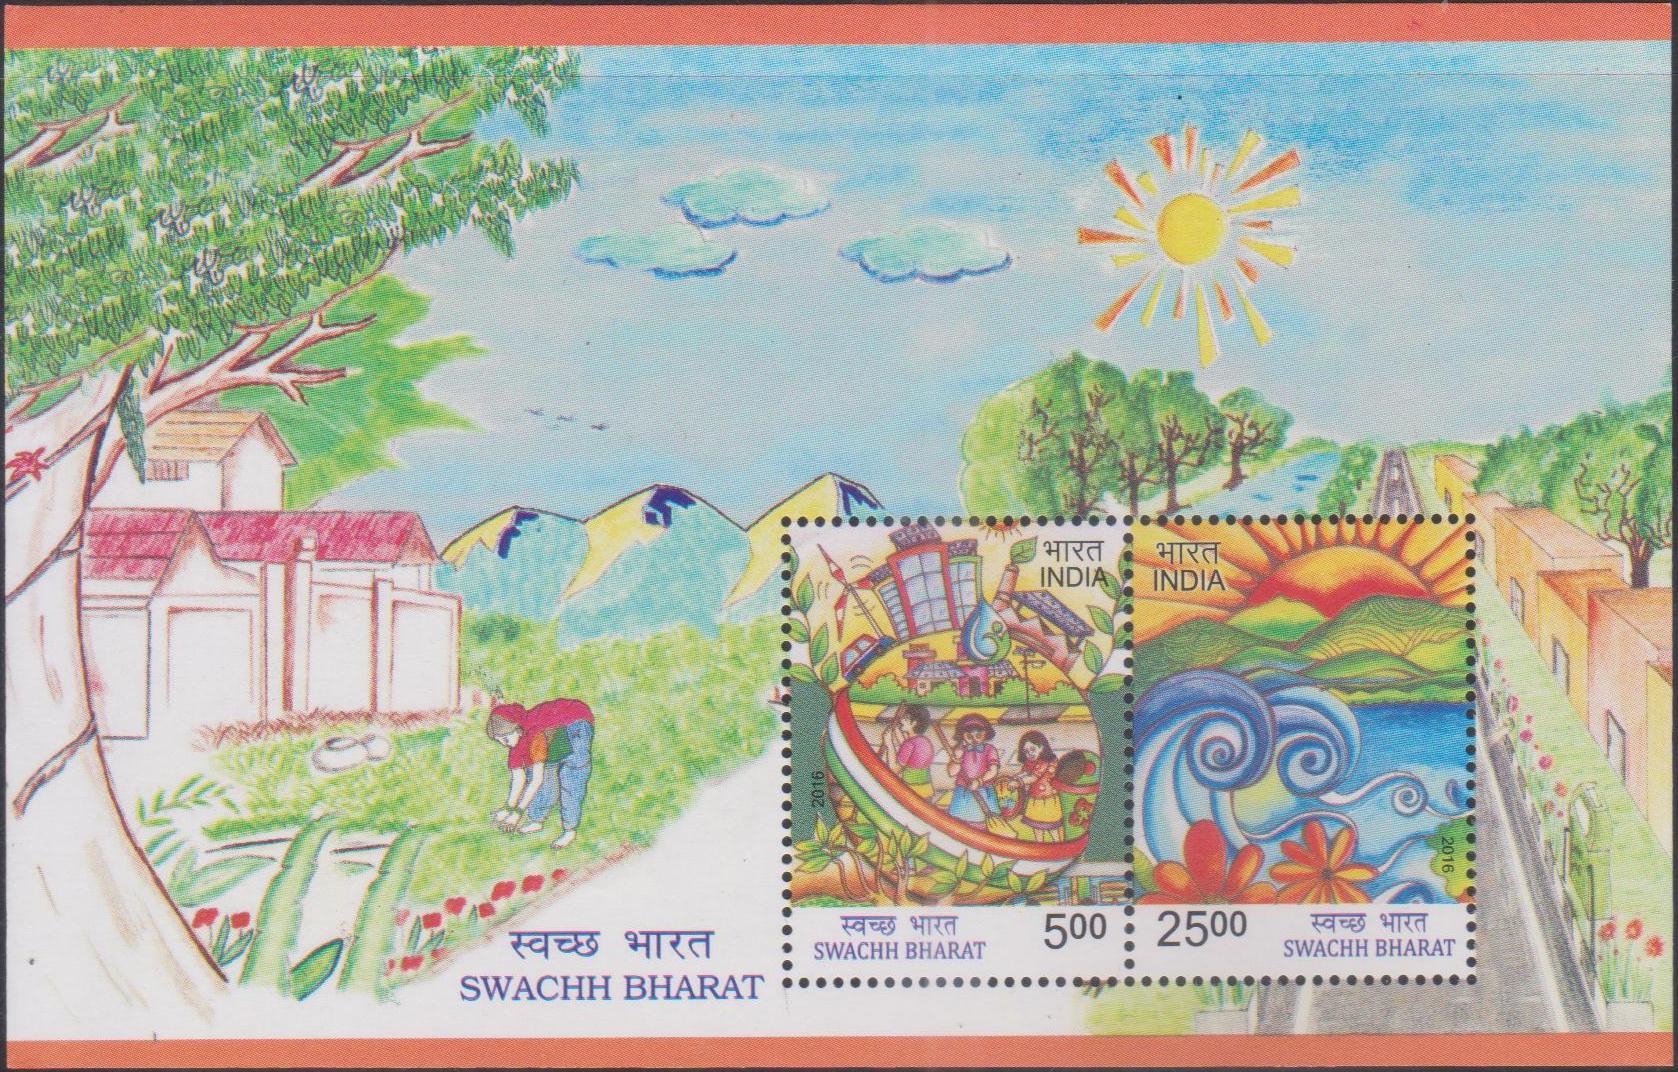 Swachh Bharat Abhiyan (SBA) : Swachh Bharat Mission (SBM)